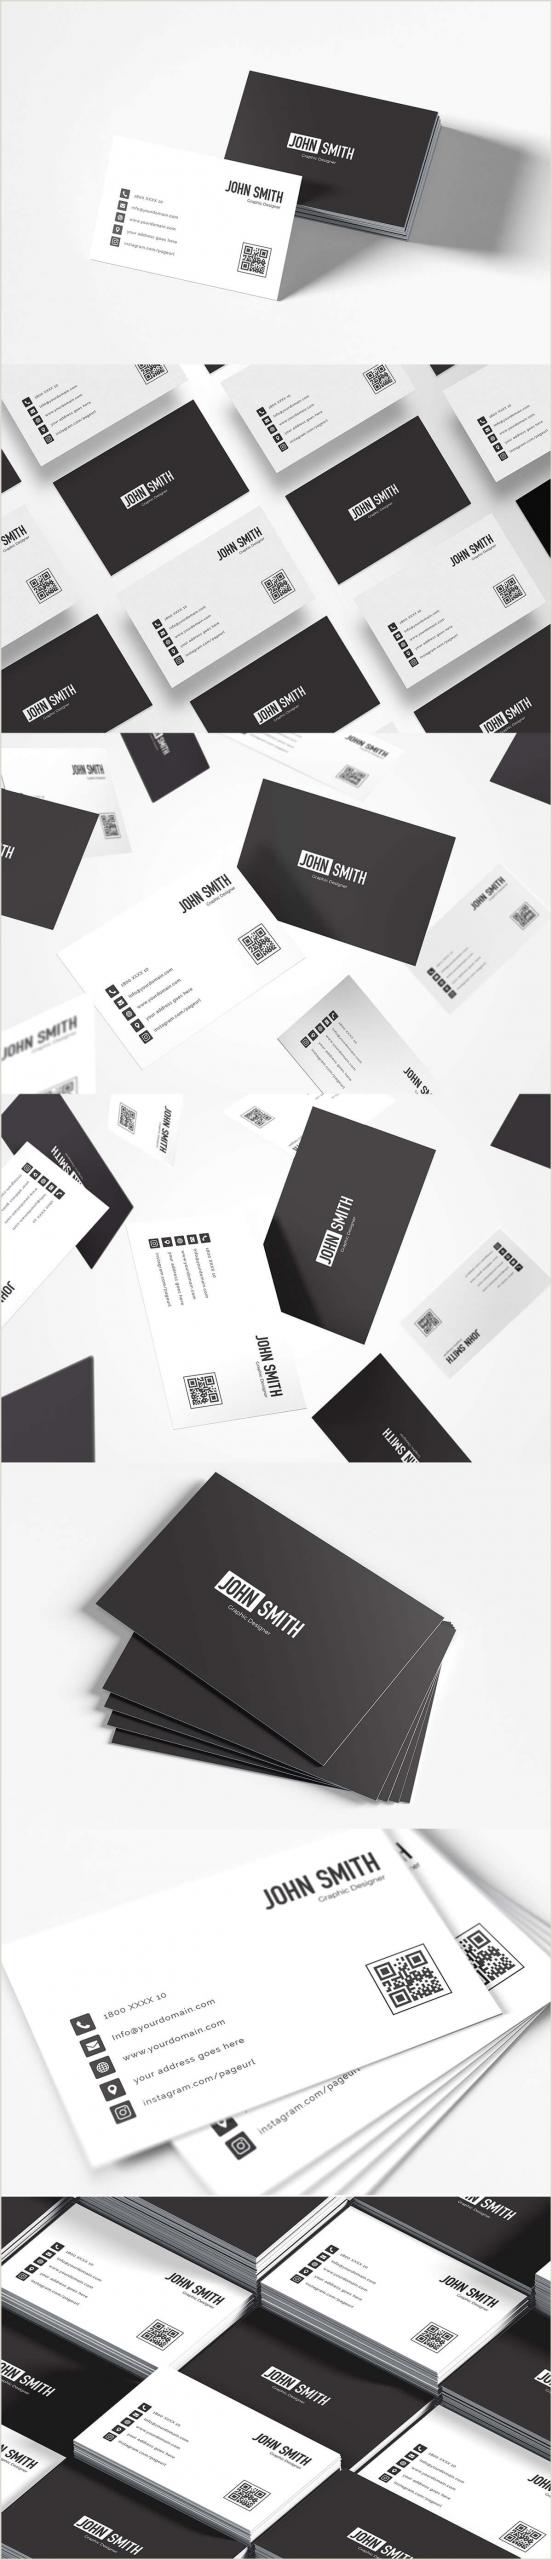 Basic Business Card Template Free Simple Business Card Template Creativetacos